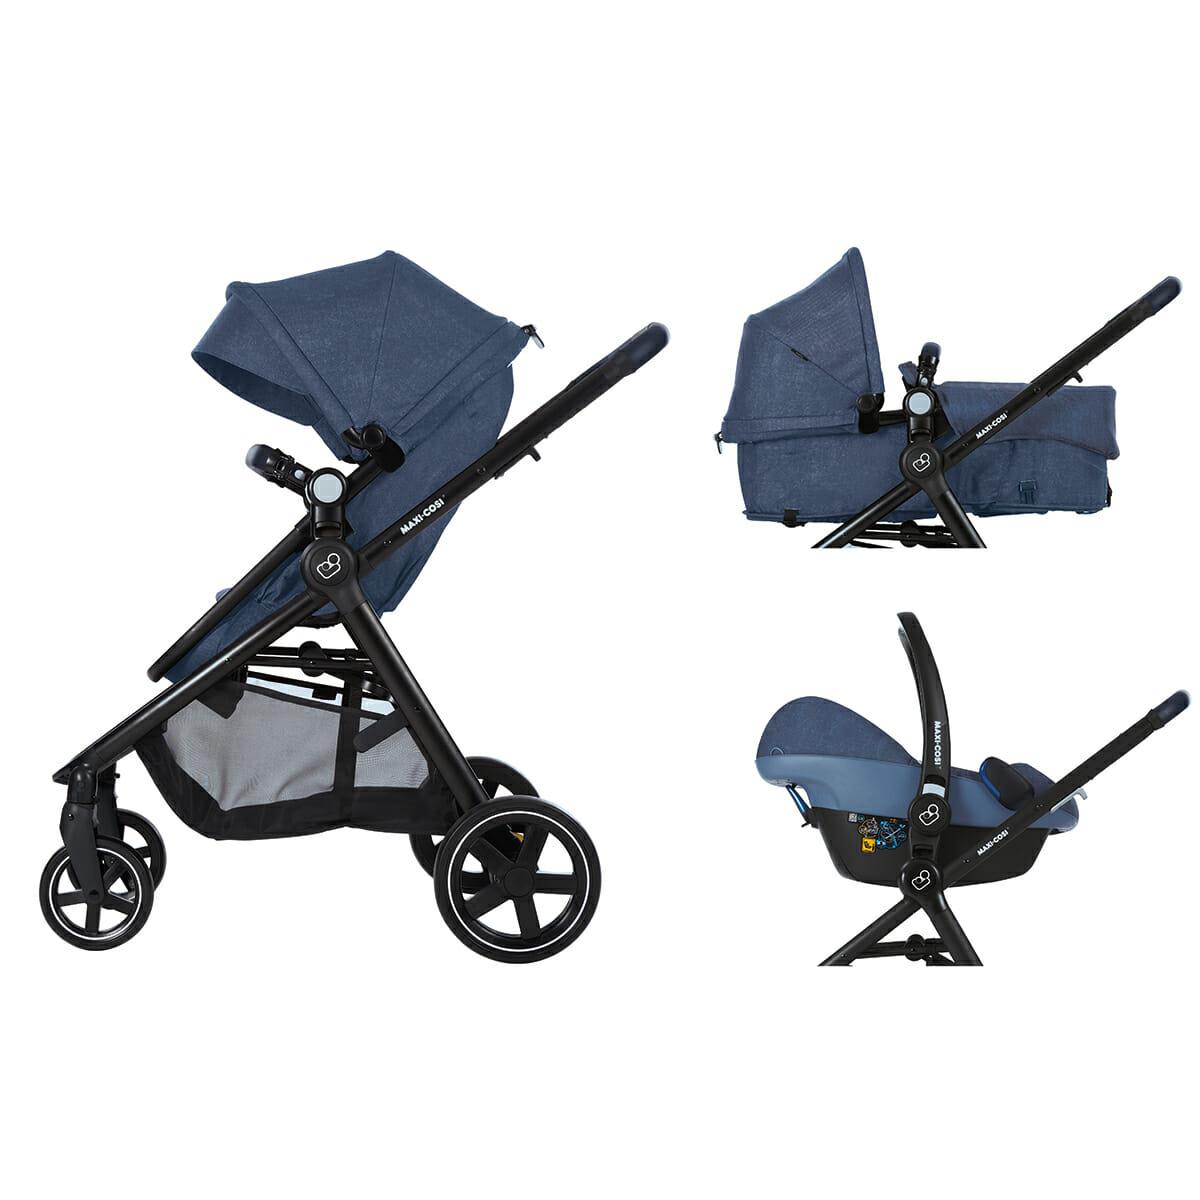 Maxicosi Stroller Travelsystem Zelia Blue Nomadblue Flexibletrav